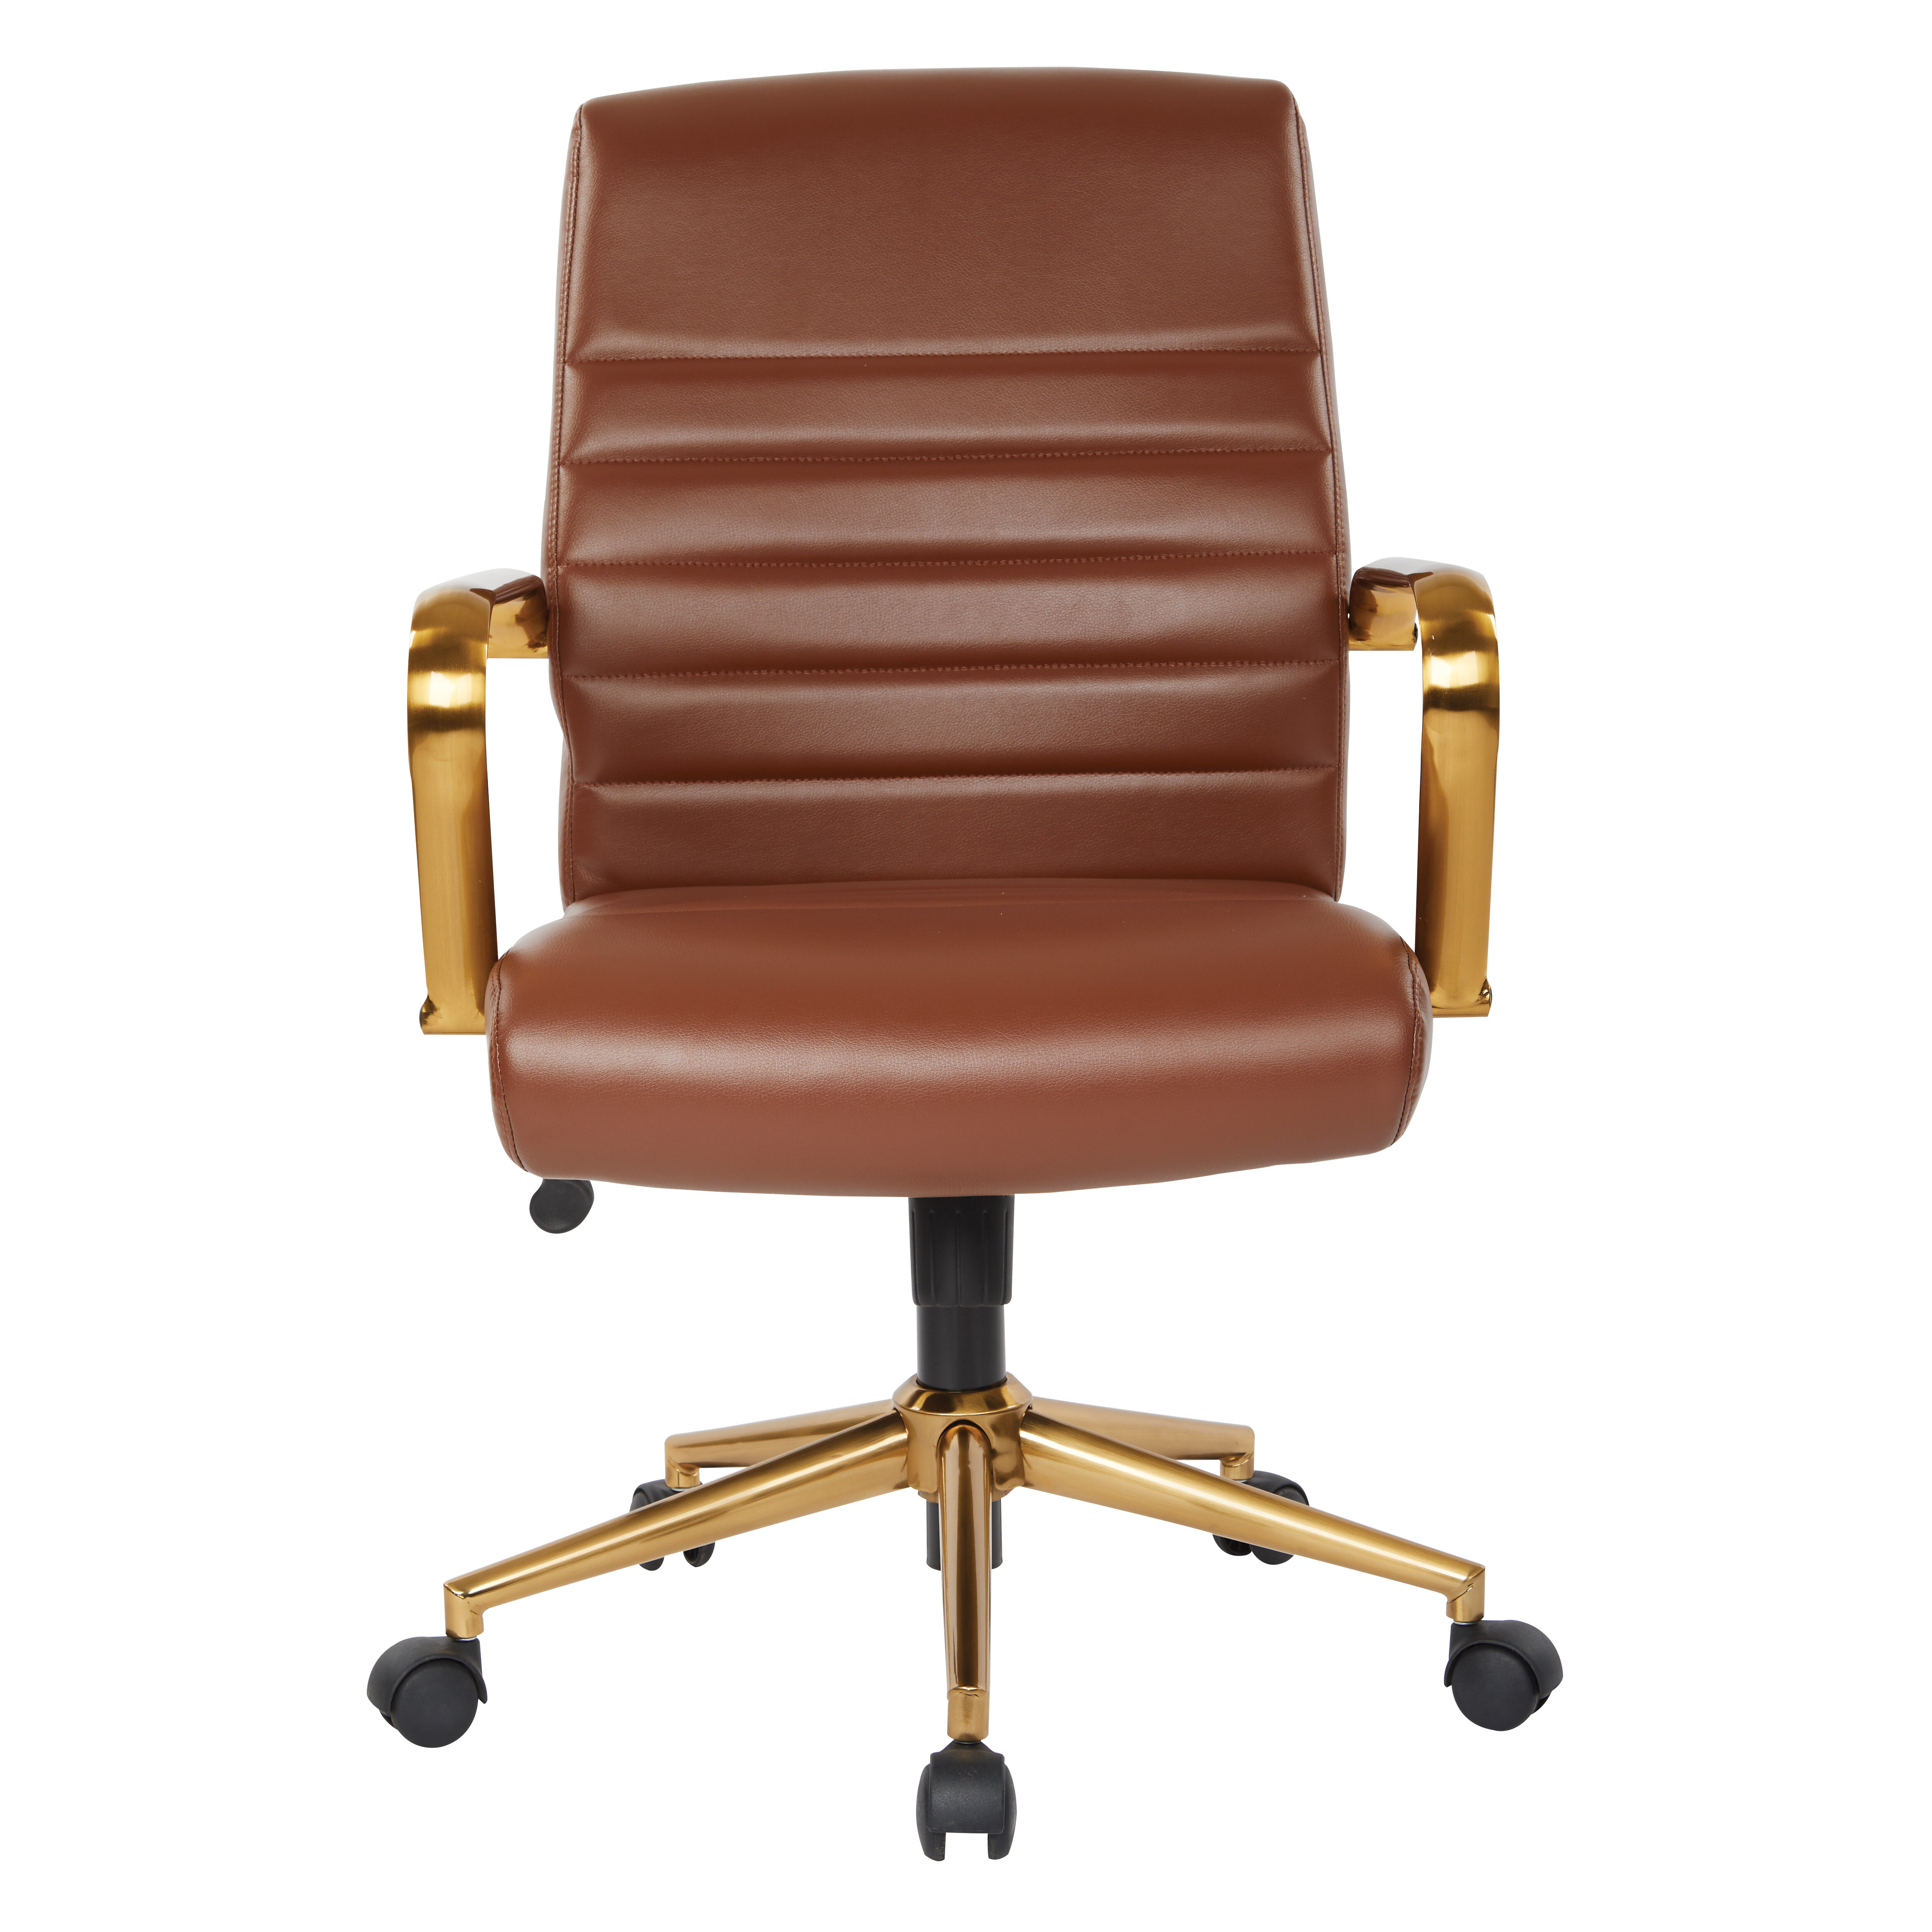 ergonomic office chairs adjustable mercer41 florida ergonomic office chair reviews wayfair